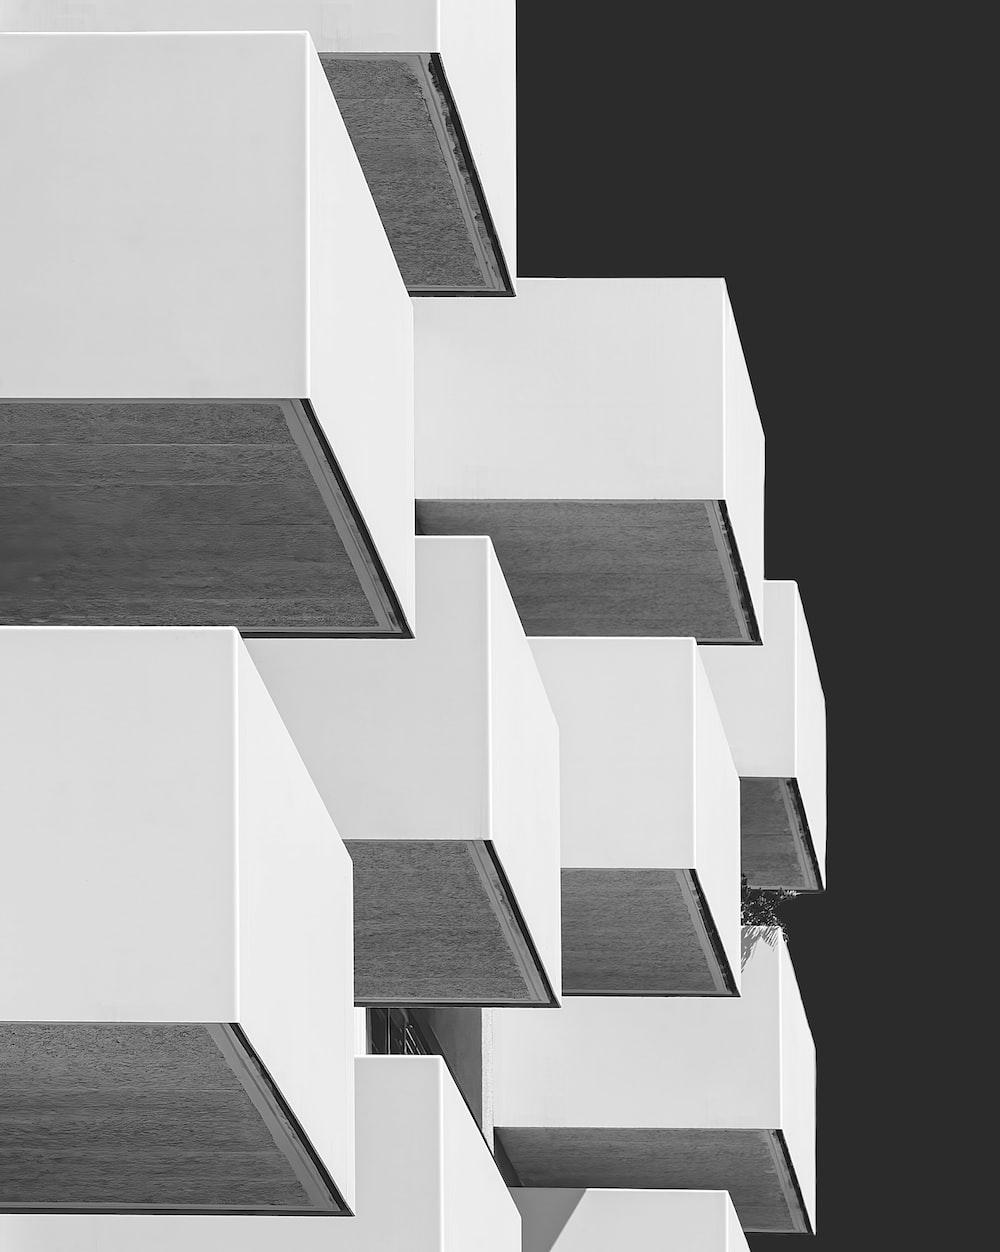 gray and white blocks illustration